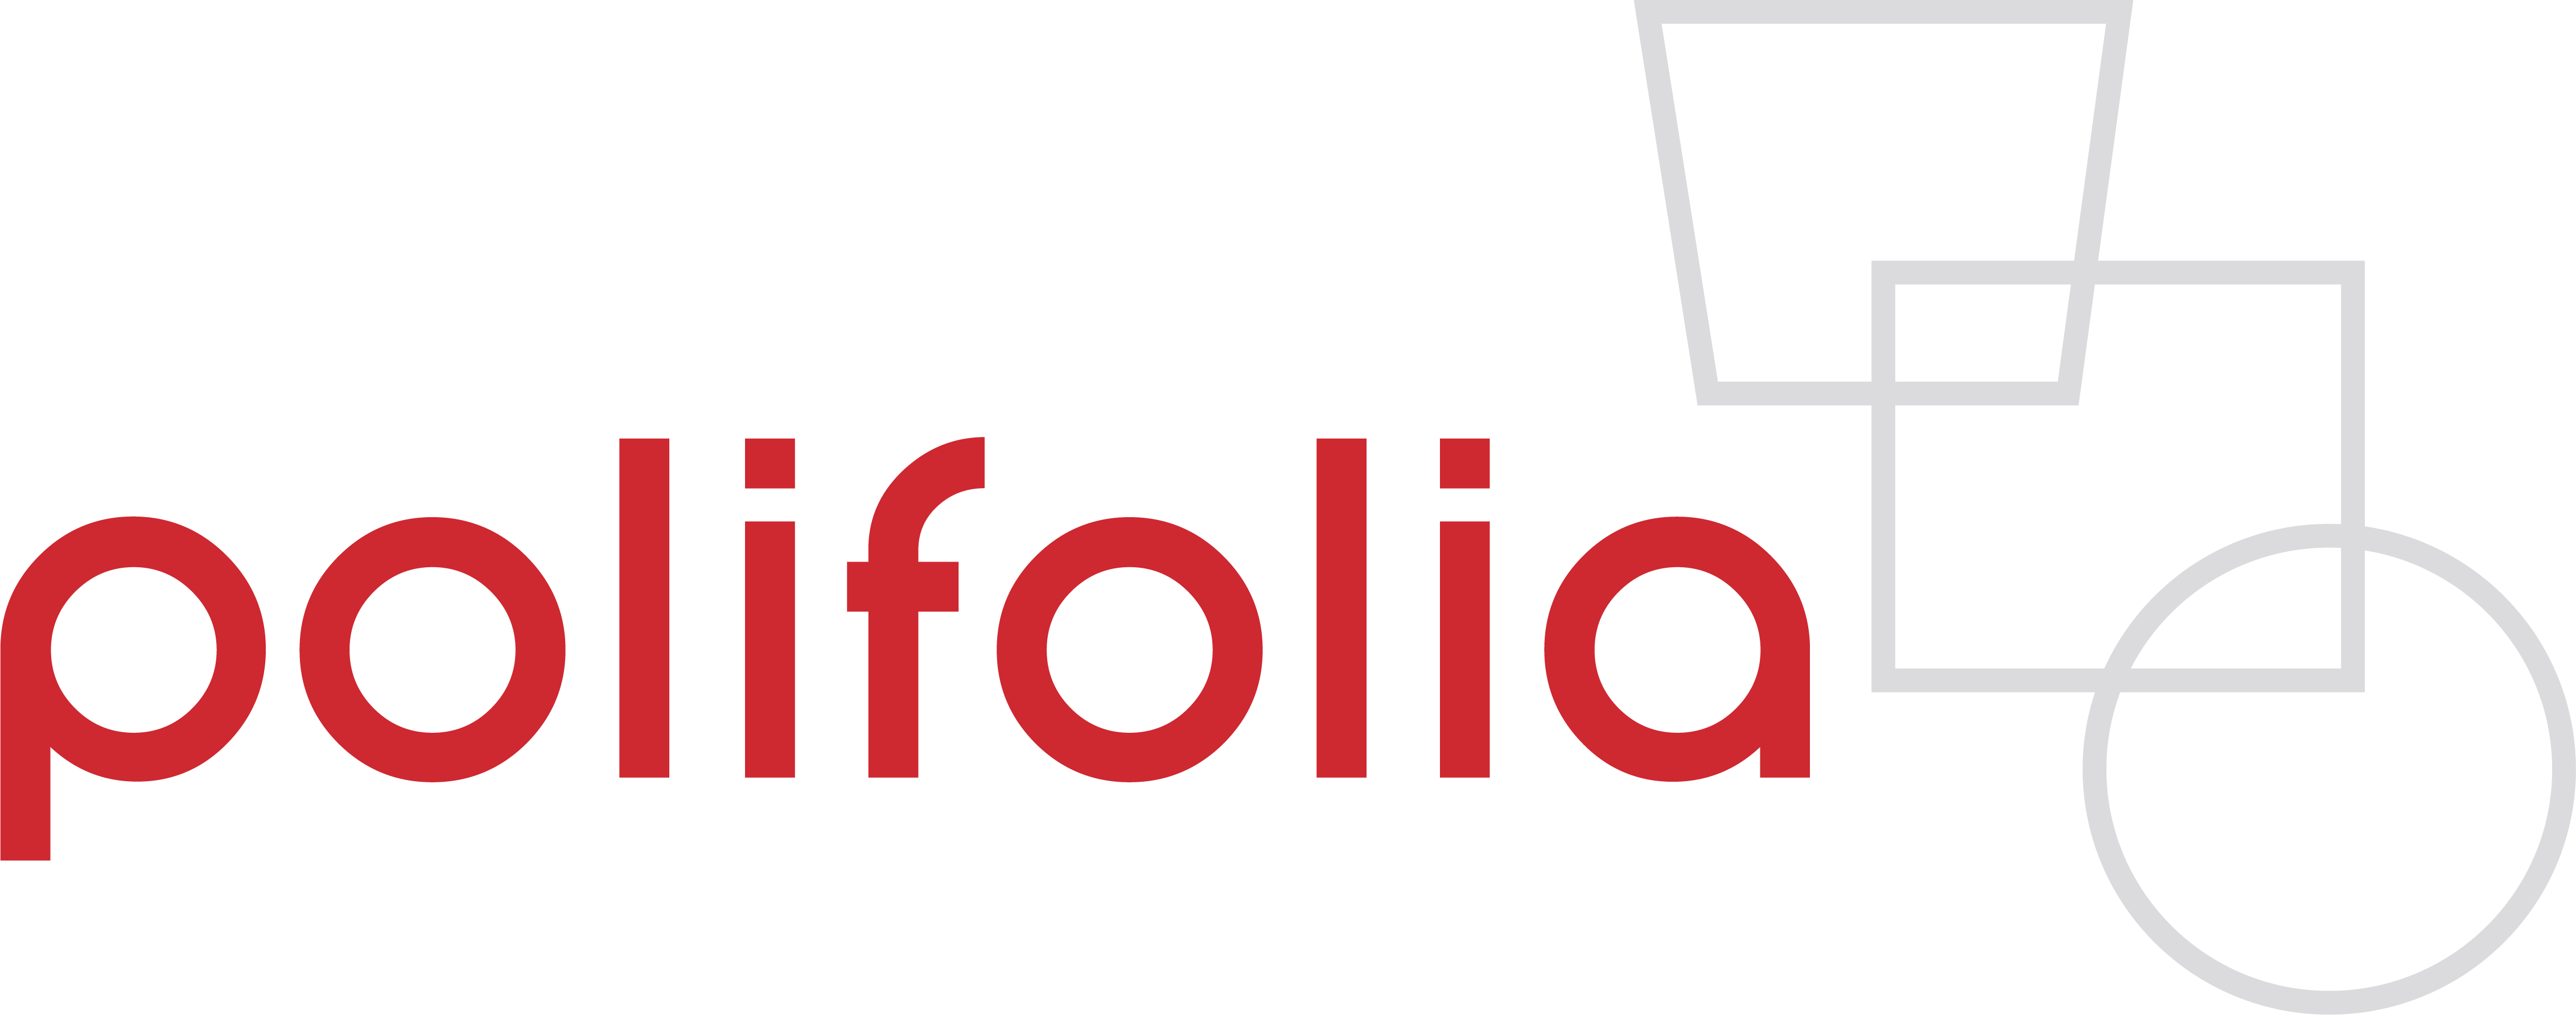 Polifolia